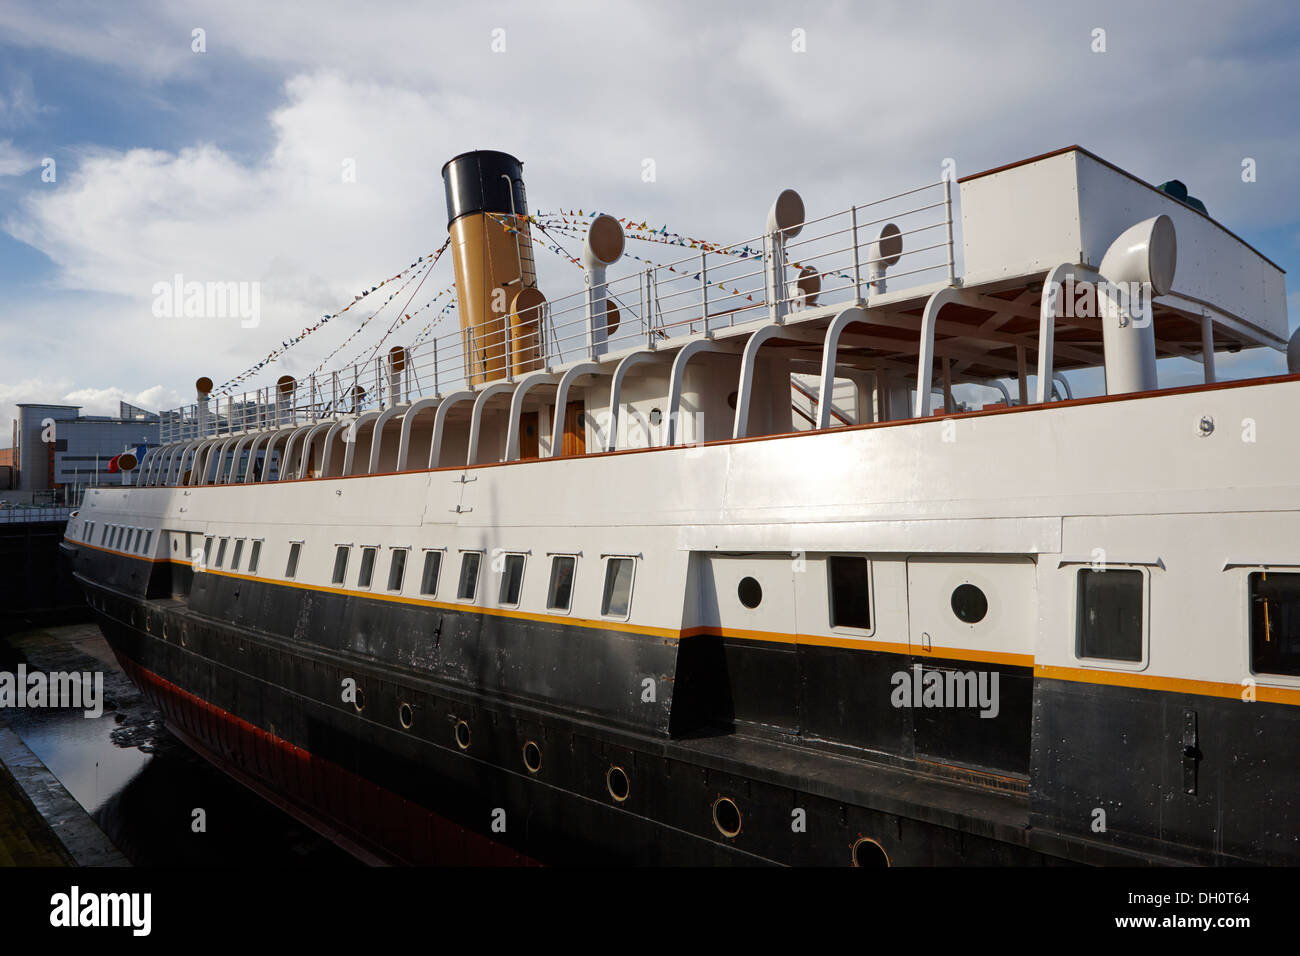 ss nomadic visitor attraction titanic quarter Belfast Northern Ireland - Stock Image